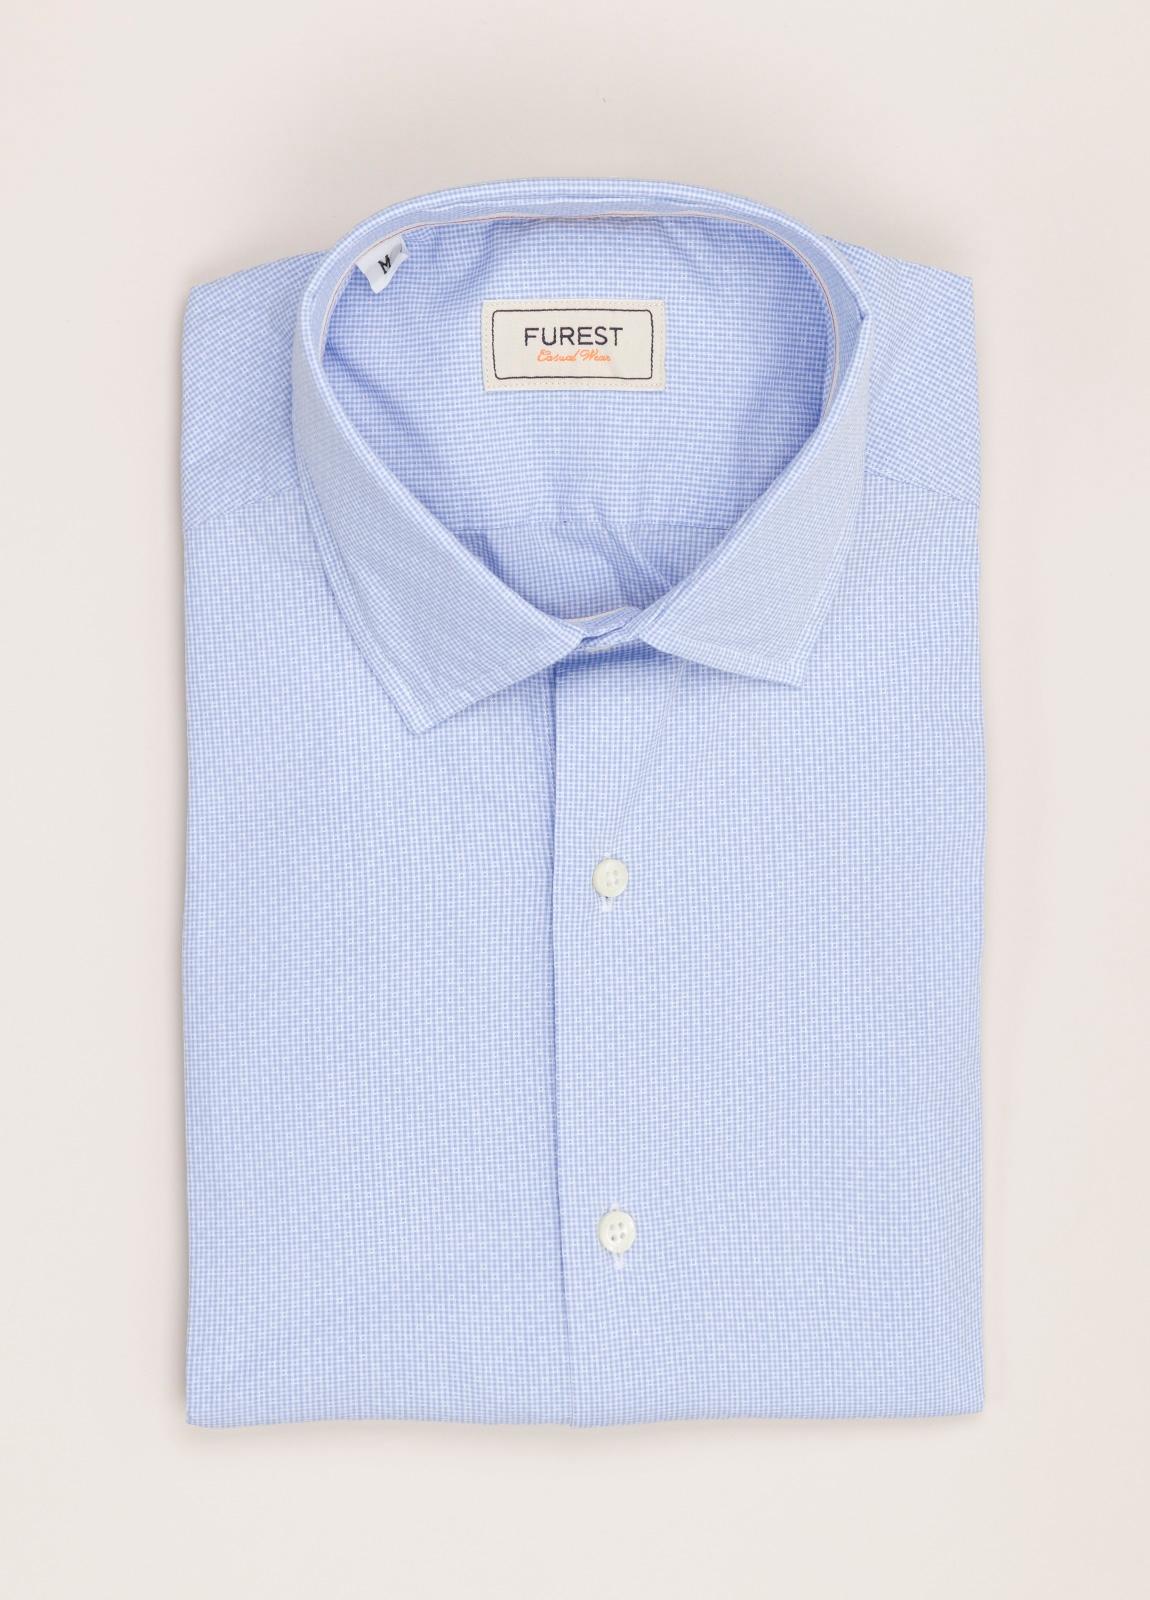 Camisa Casual Wear FUREST COLECCIÓN slim fit fil dibujo celeste